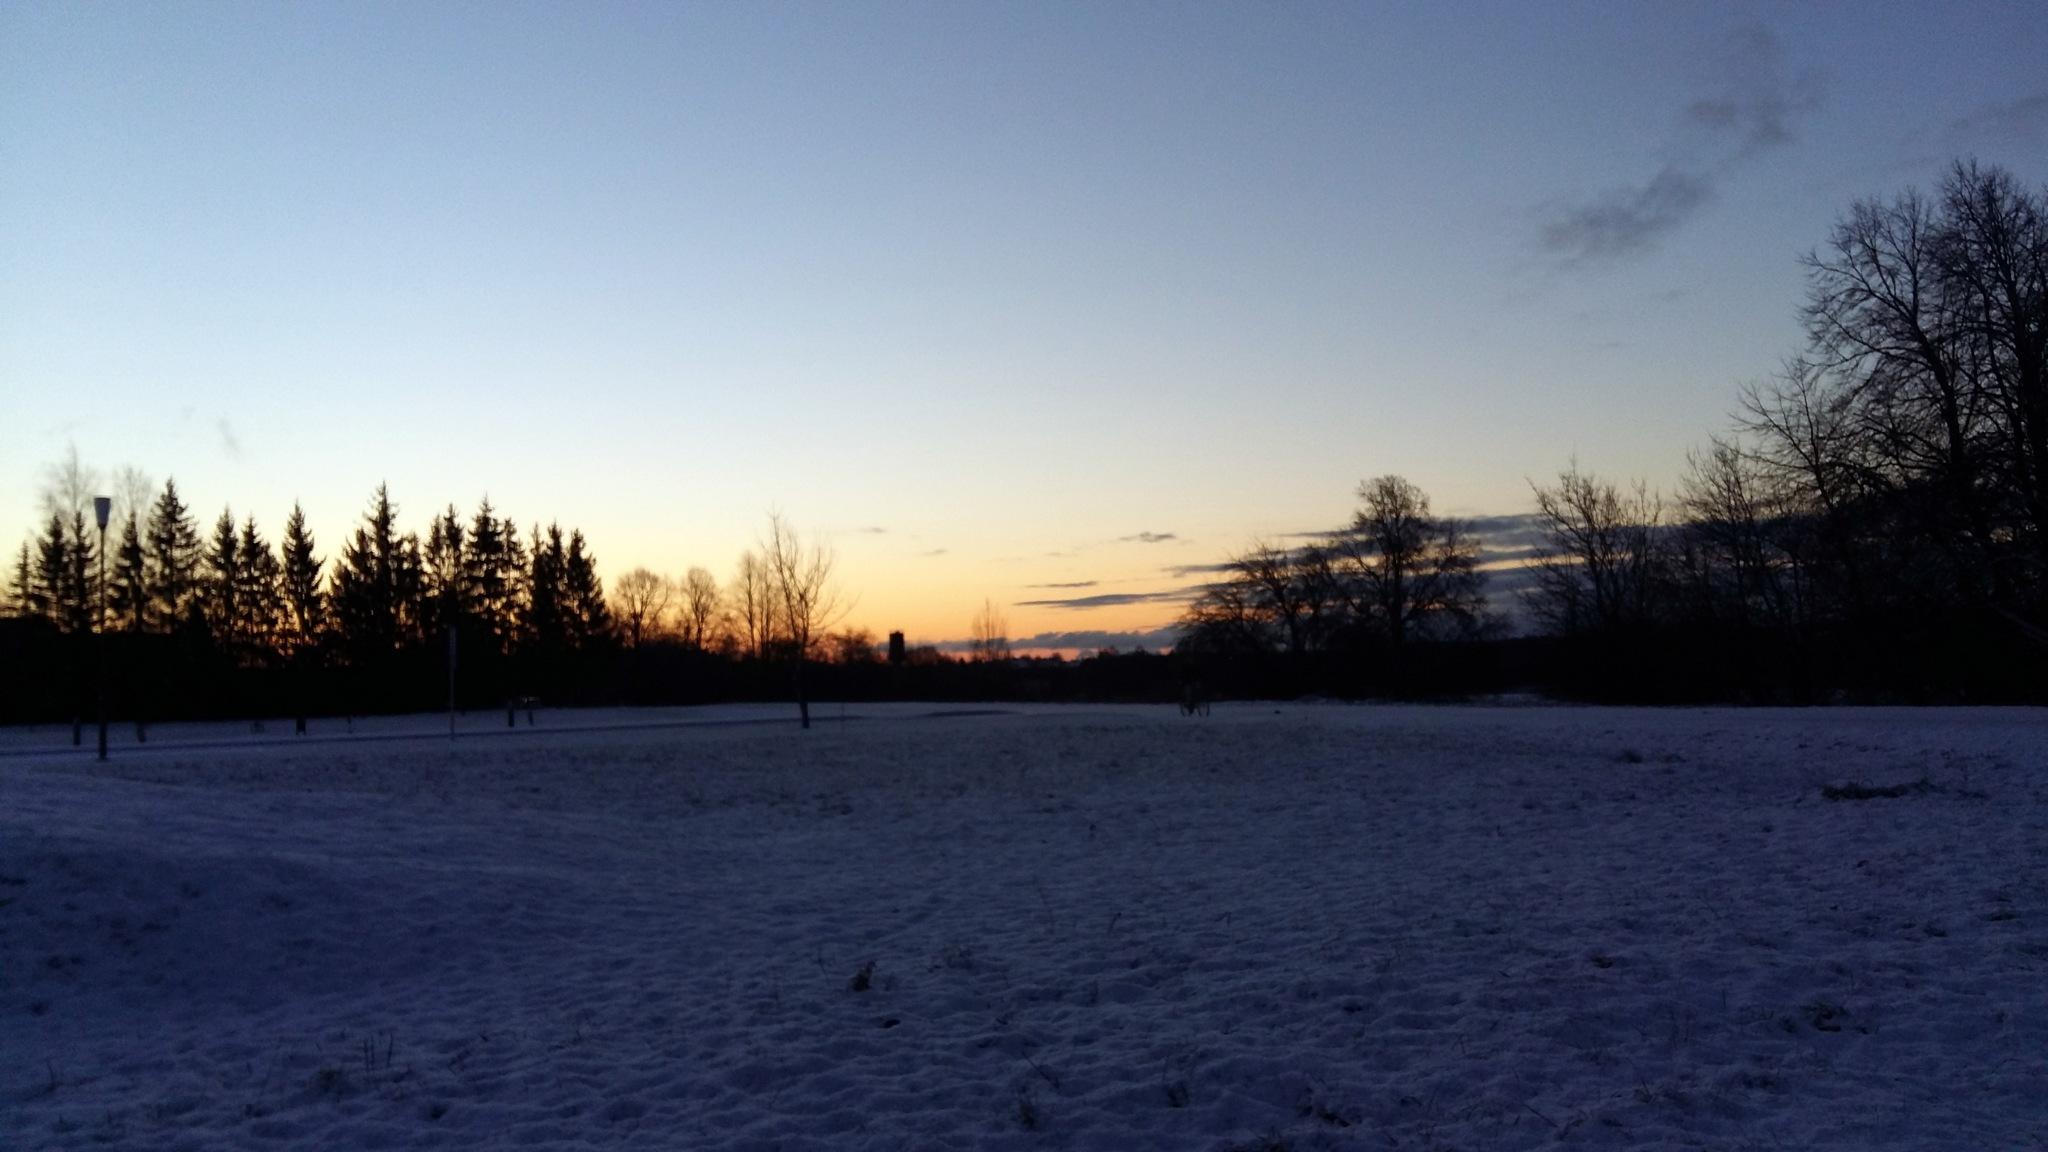 Winter morning by uzkuraitiene62